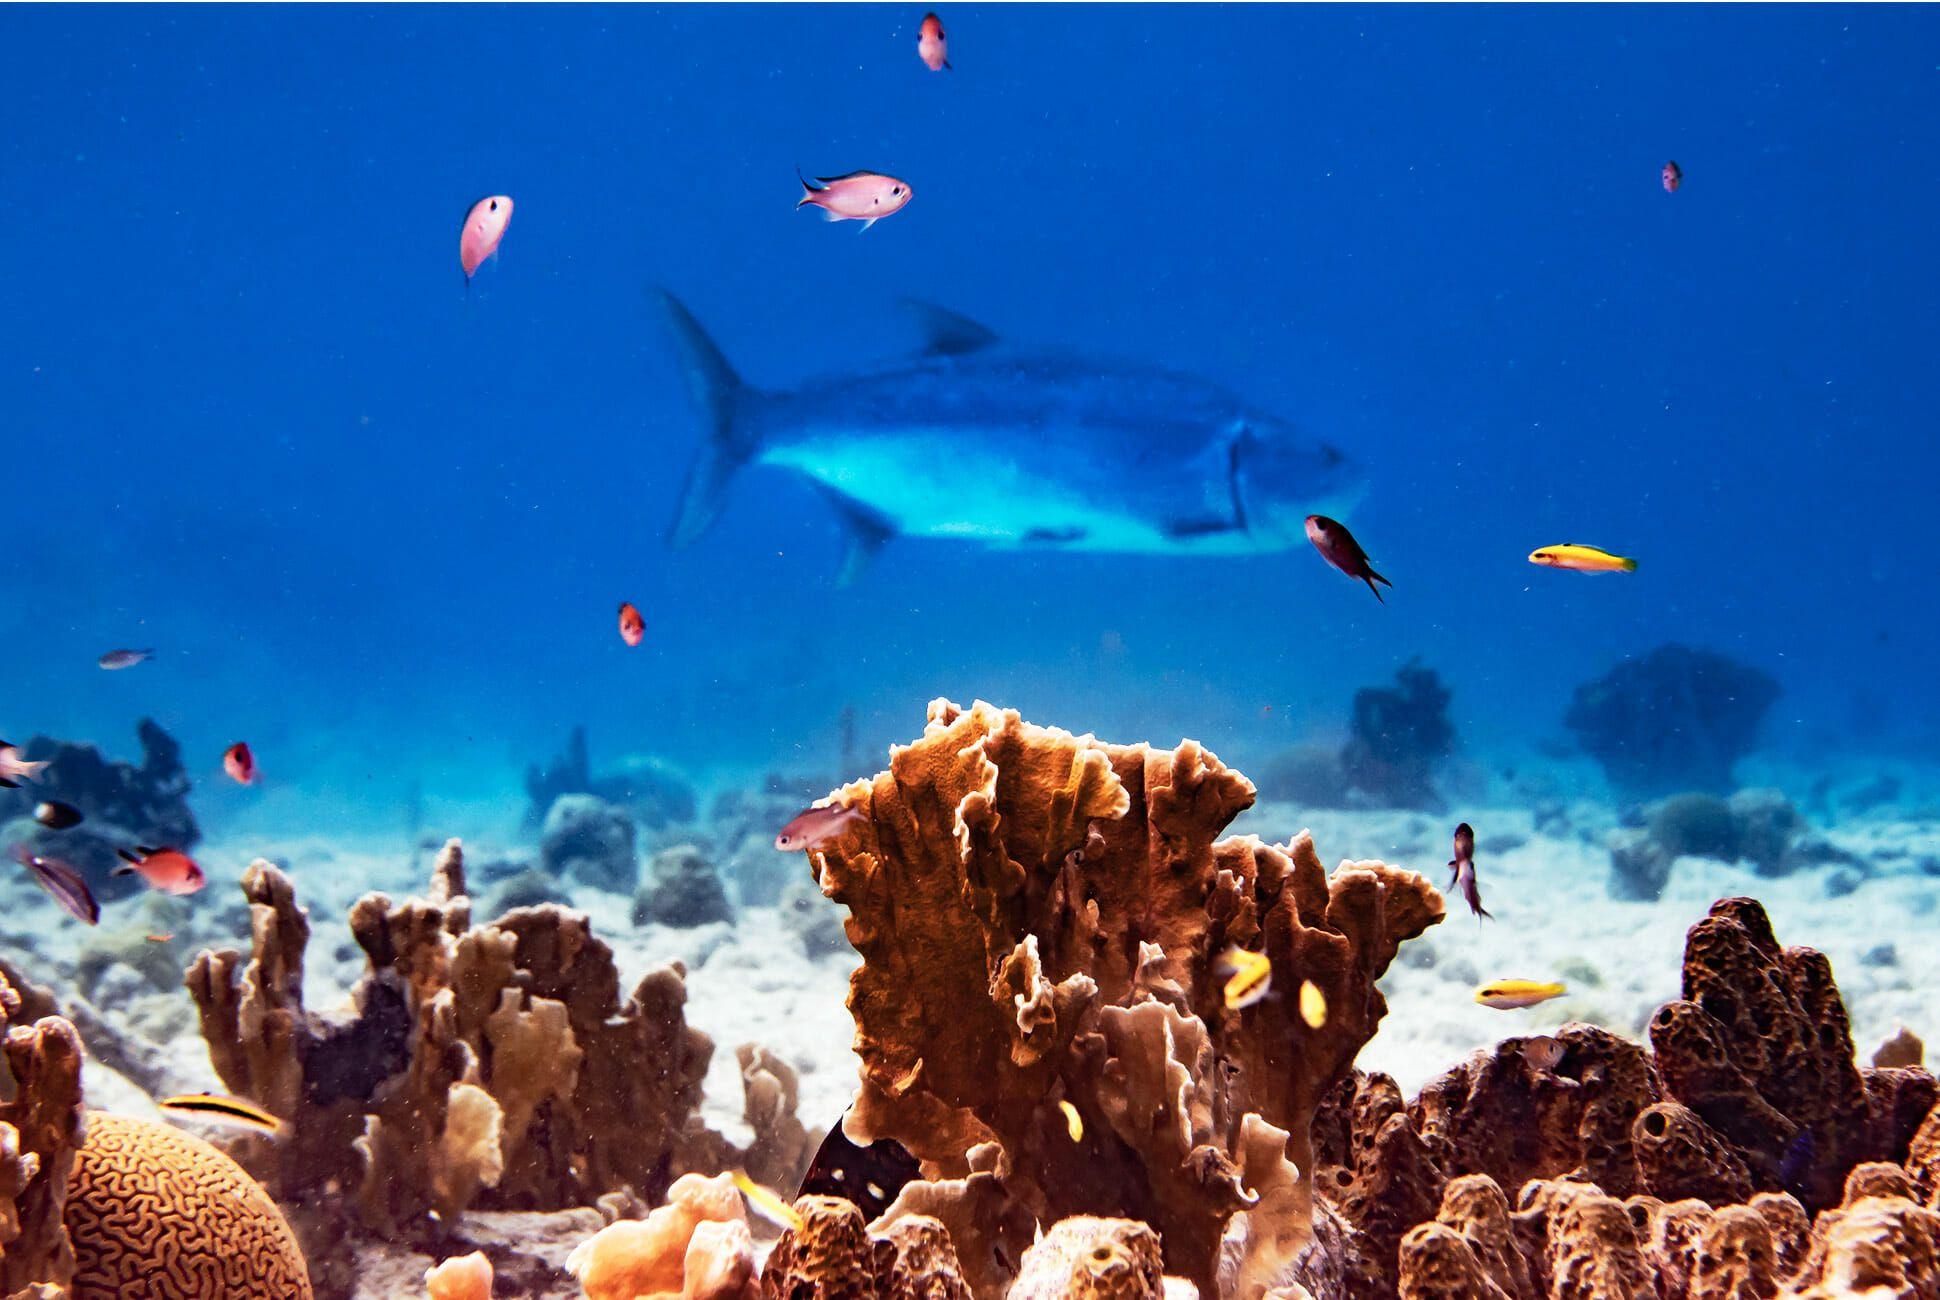 Diving-With-Doxa-Watches-in-Bonaire-gear-patrol-ocean-4